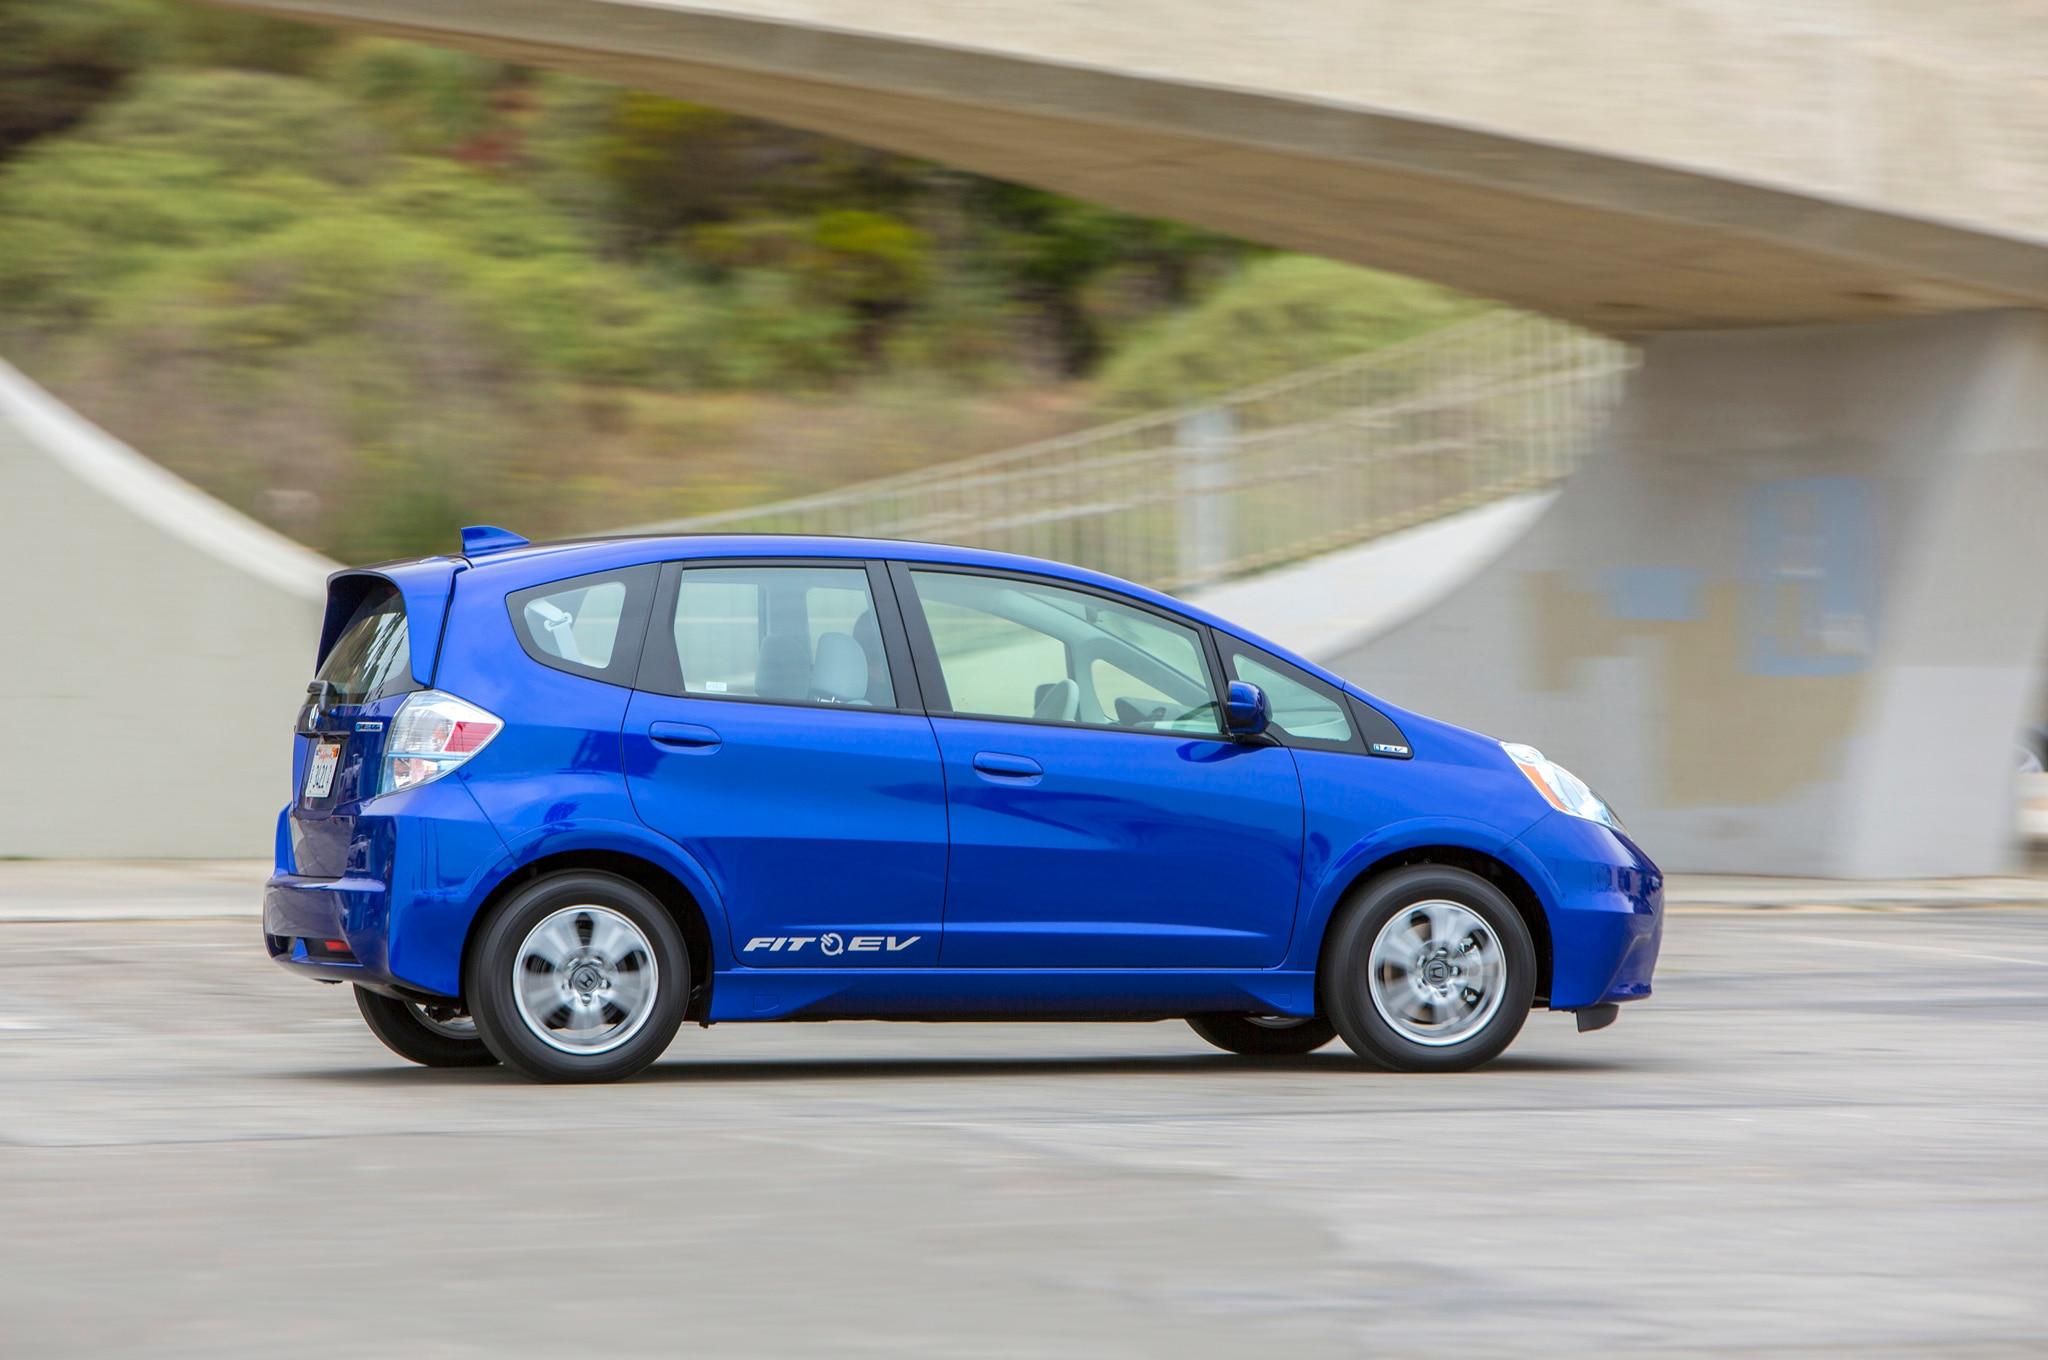 Honda fit ev lease price dropped free insurance added for Honda fit ev